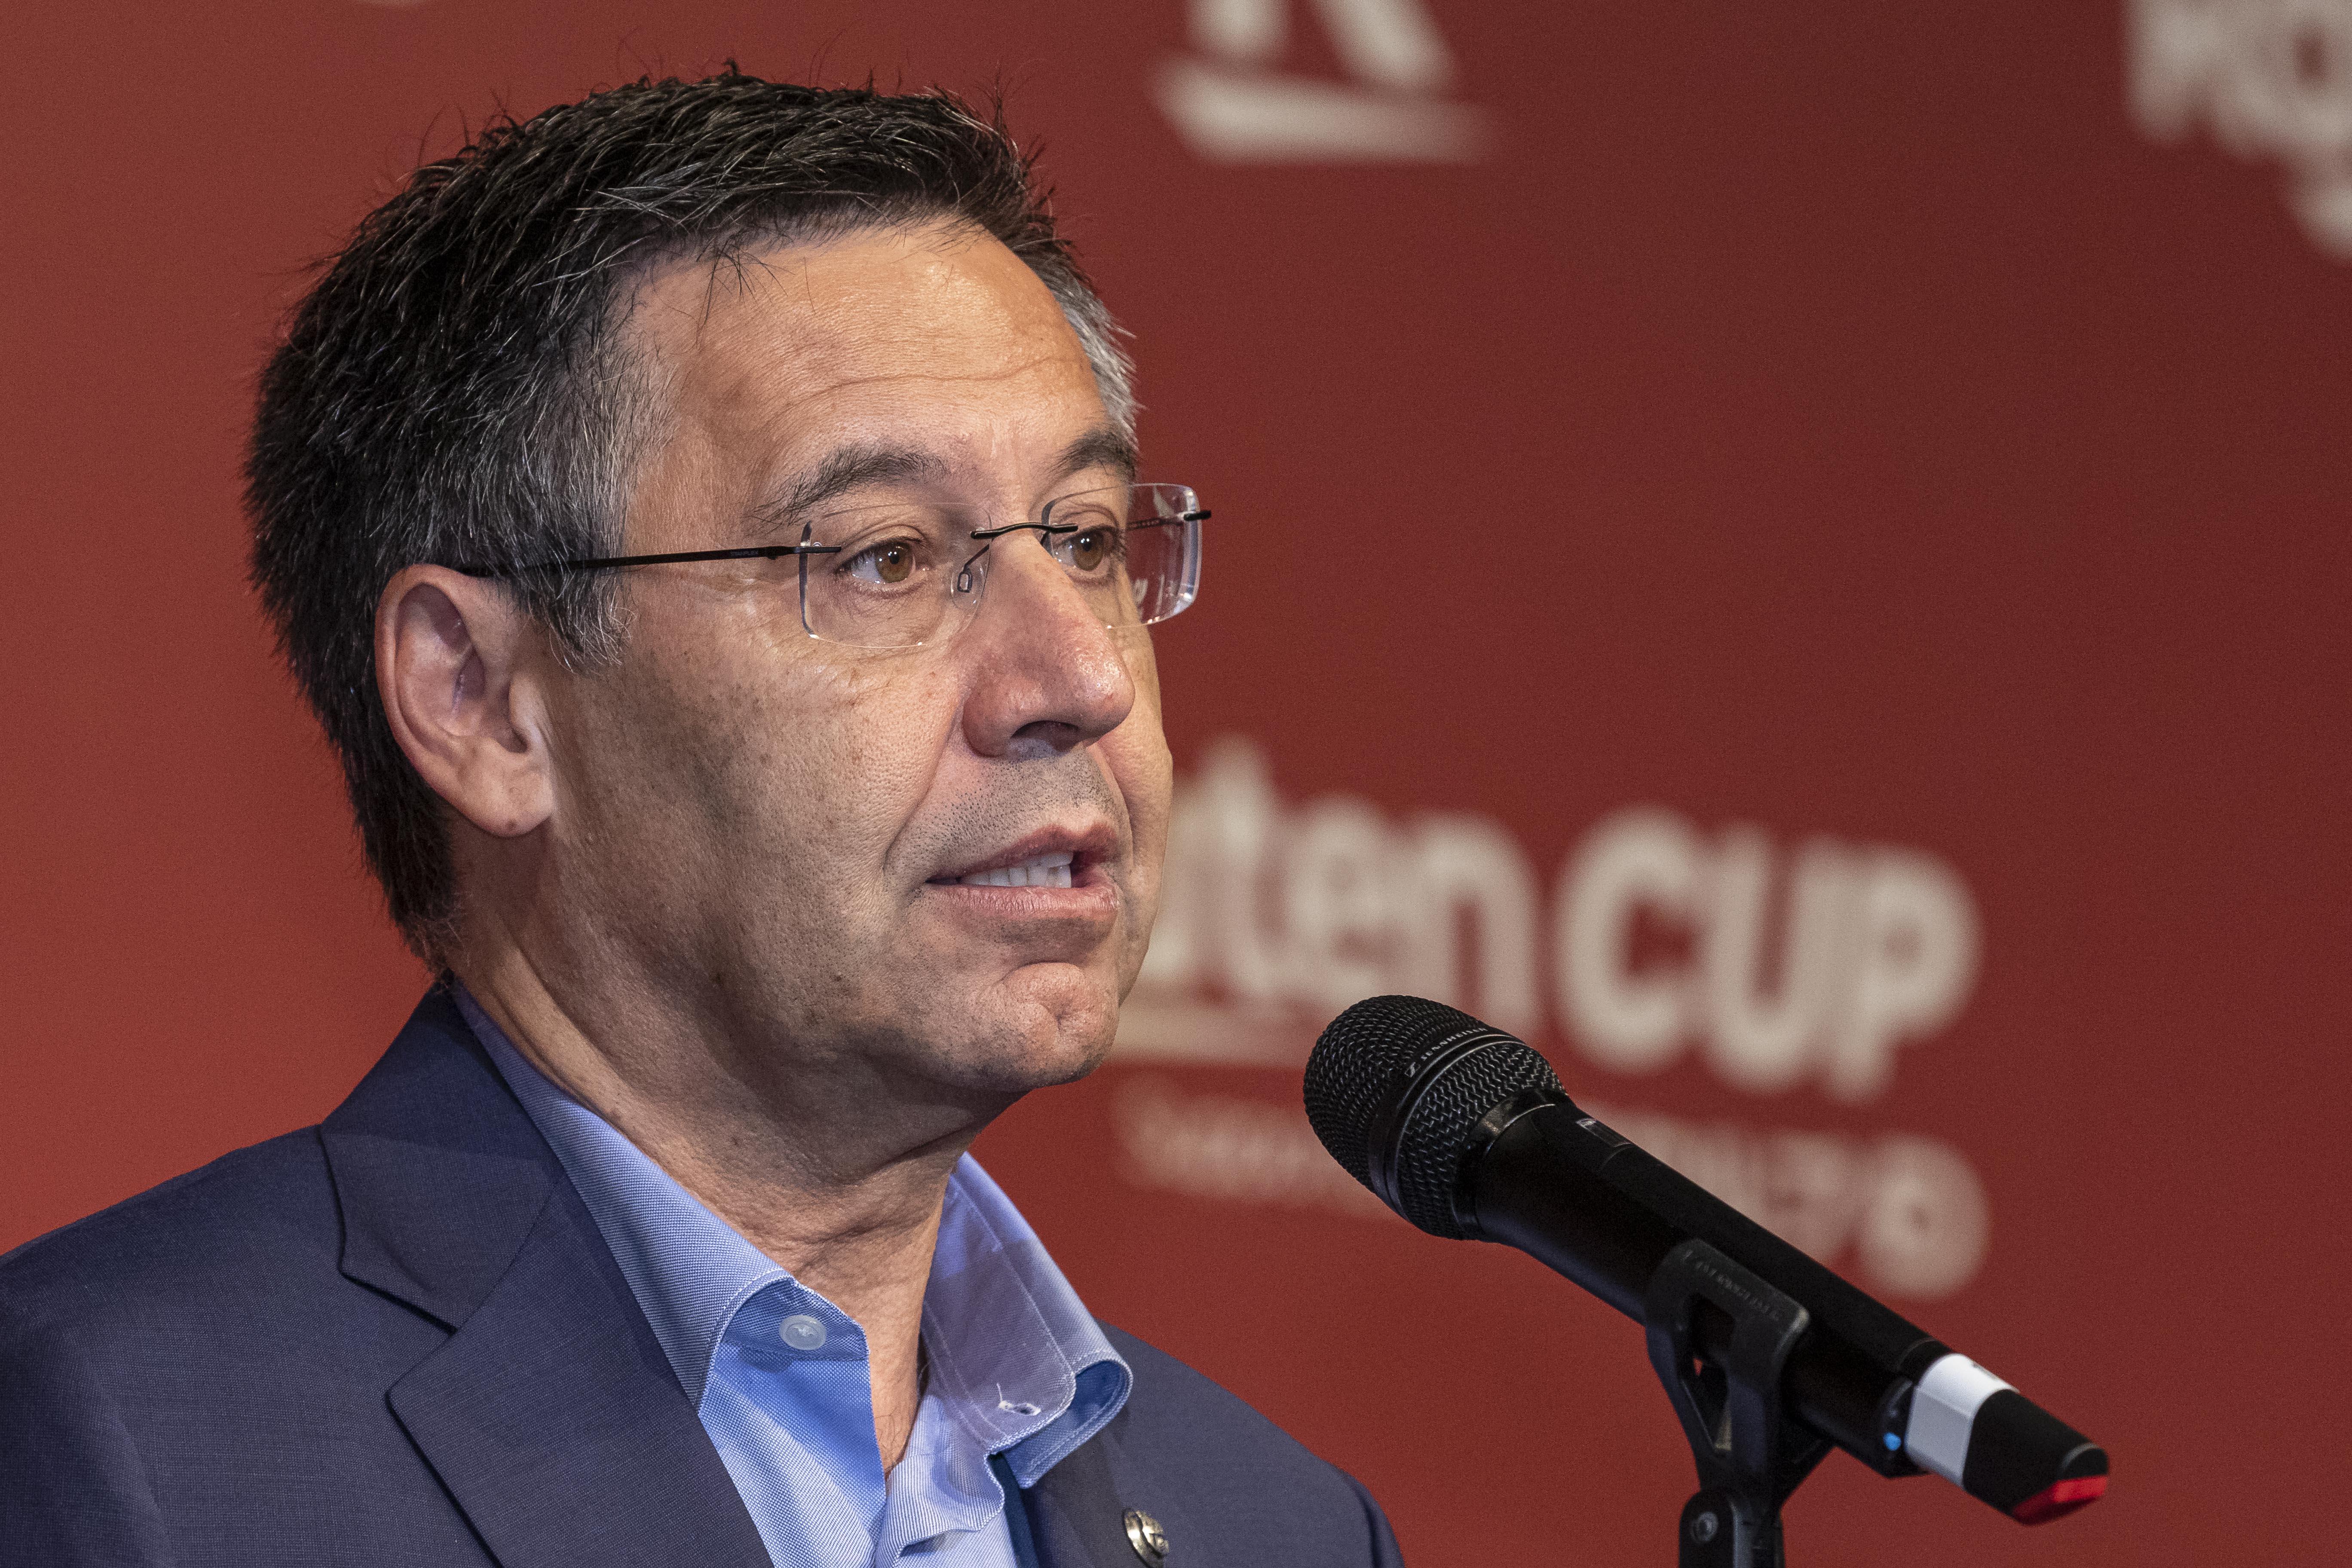 Football - Transferts - Neymar «ne renforcera pas» le Barça cet hiver, selon le président du club catalan